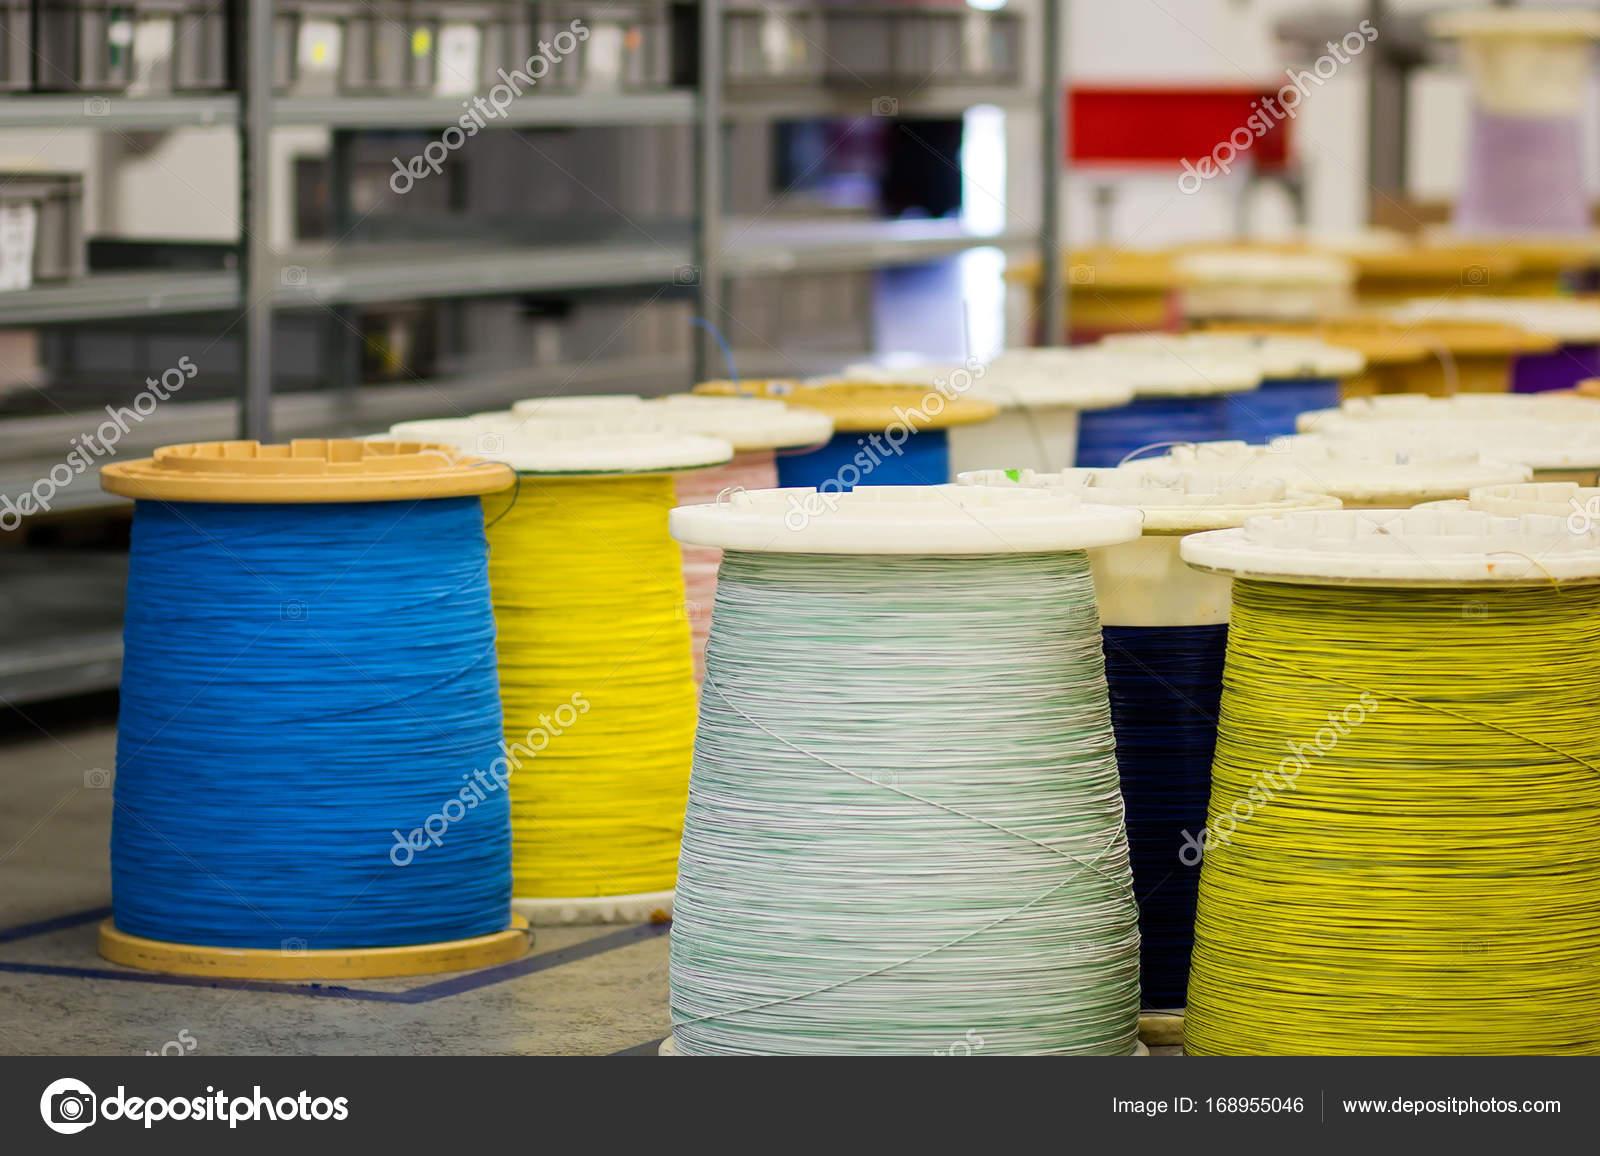 Industrielle Spulen mit Kabel — Stockfoto © MilenneT #168955046